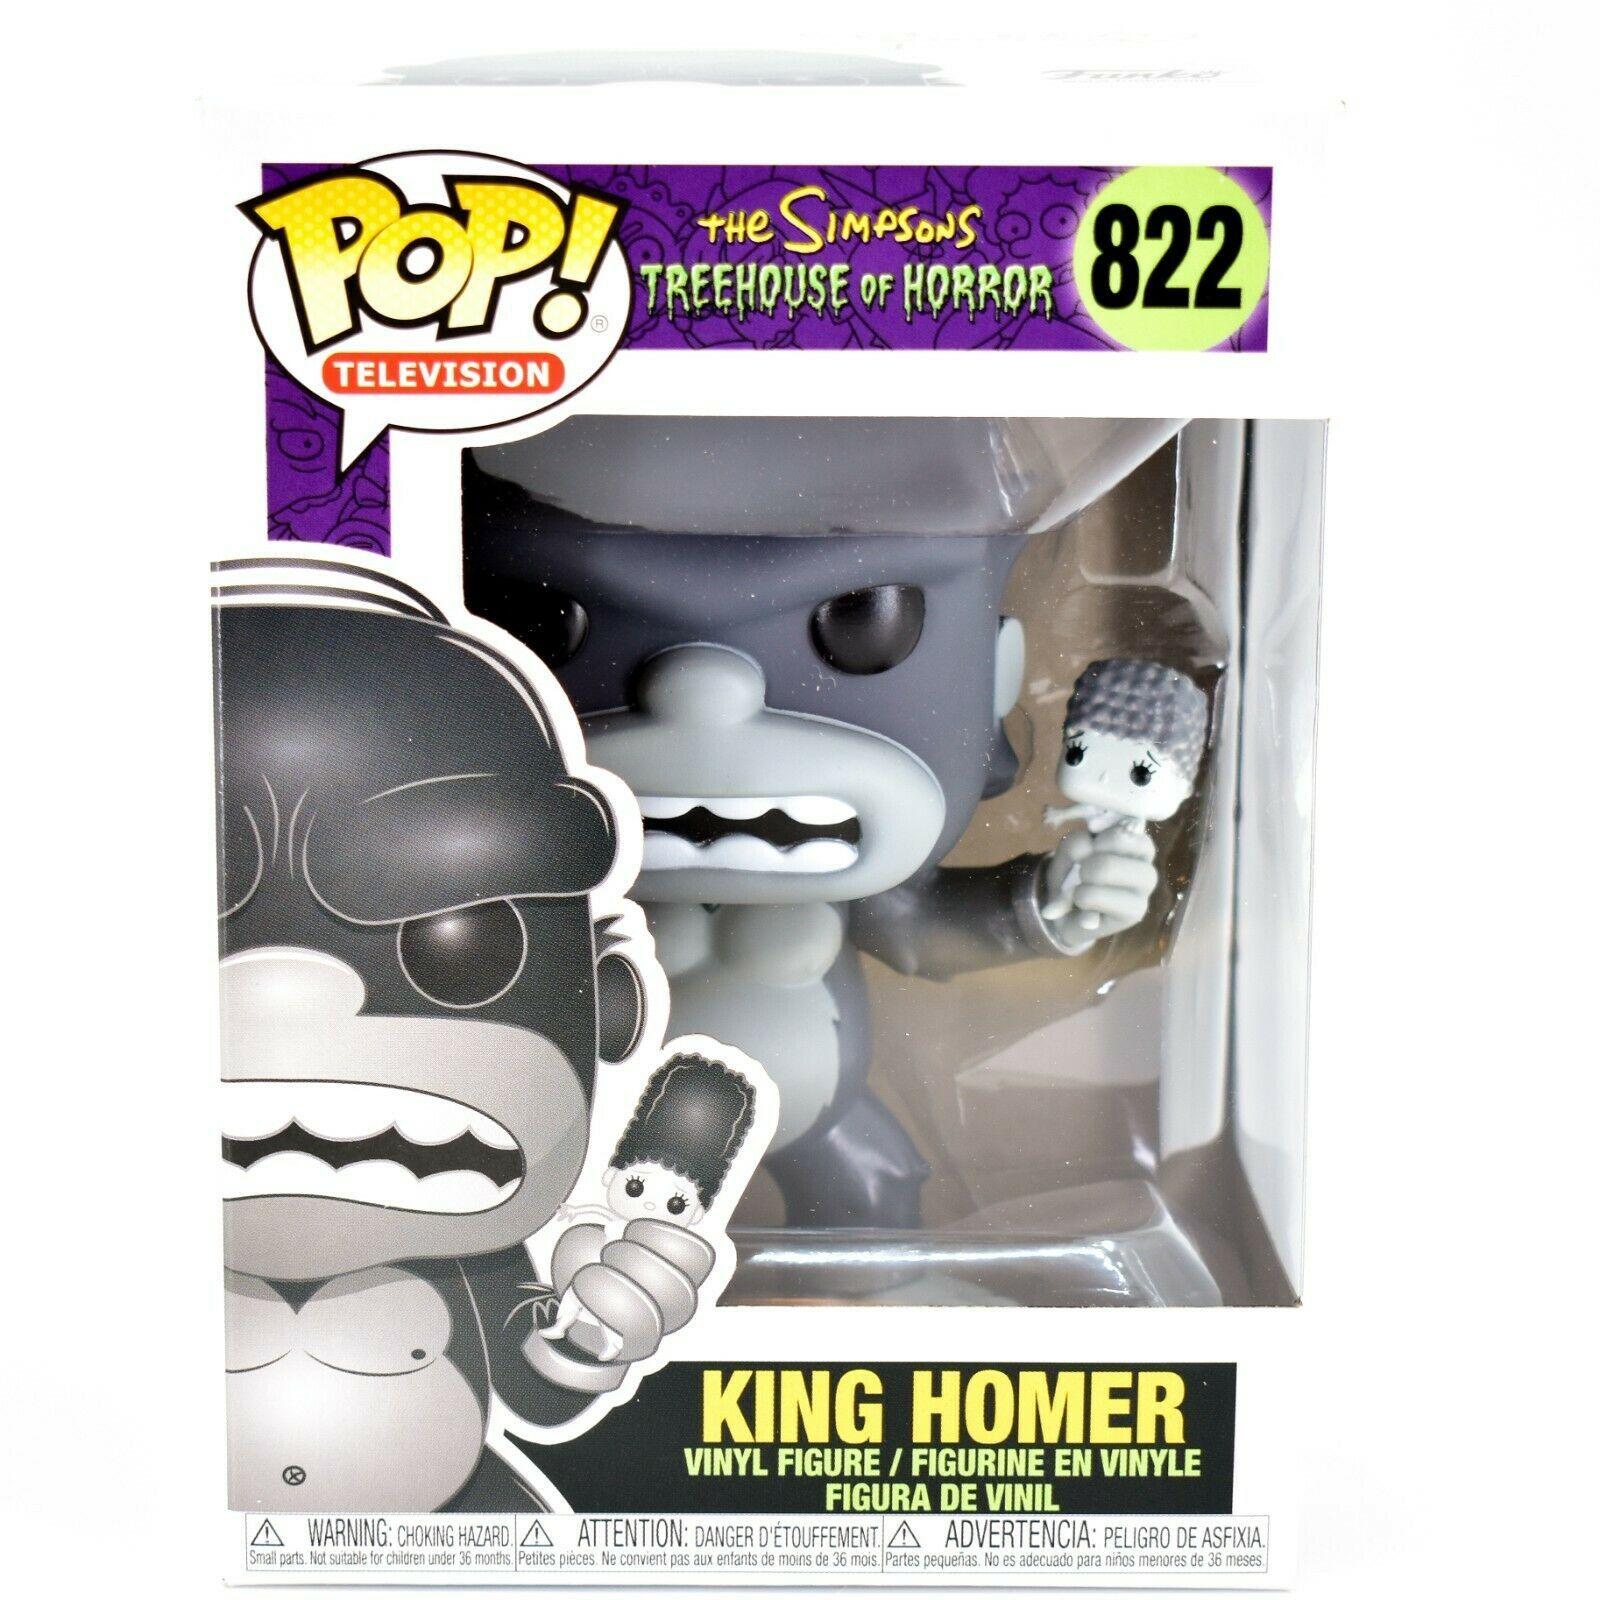 Funko Pop! The Simpsons Treehouse of Horror King Homer #822 Vinyl Figure